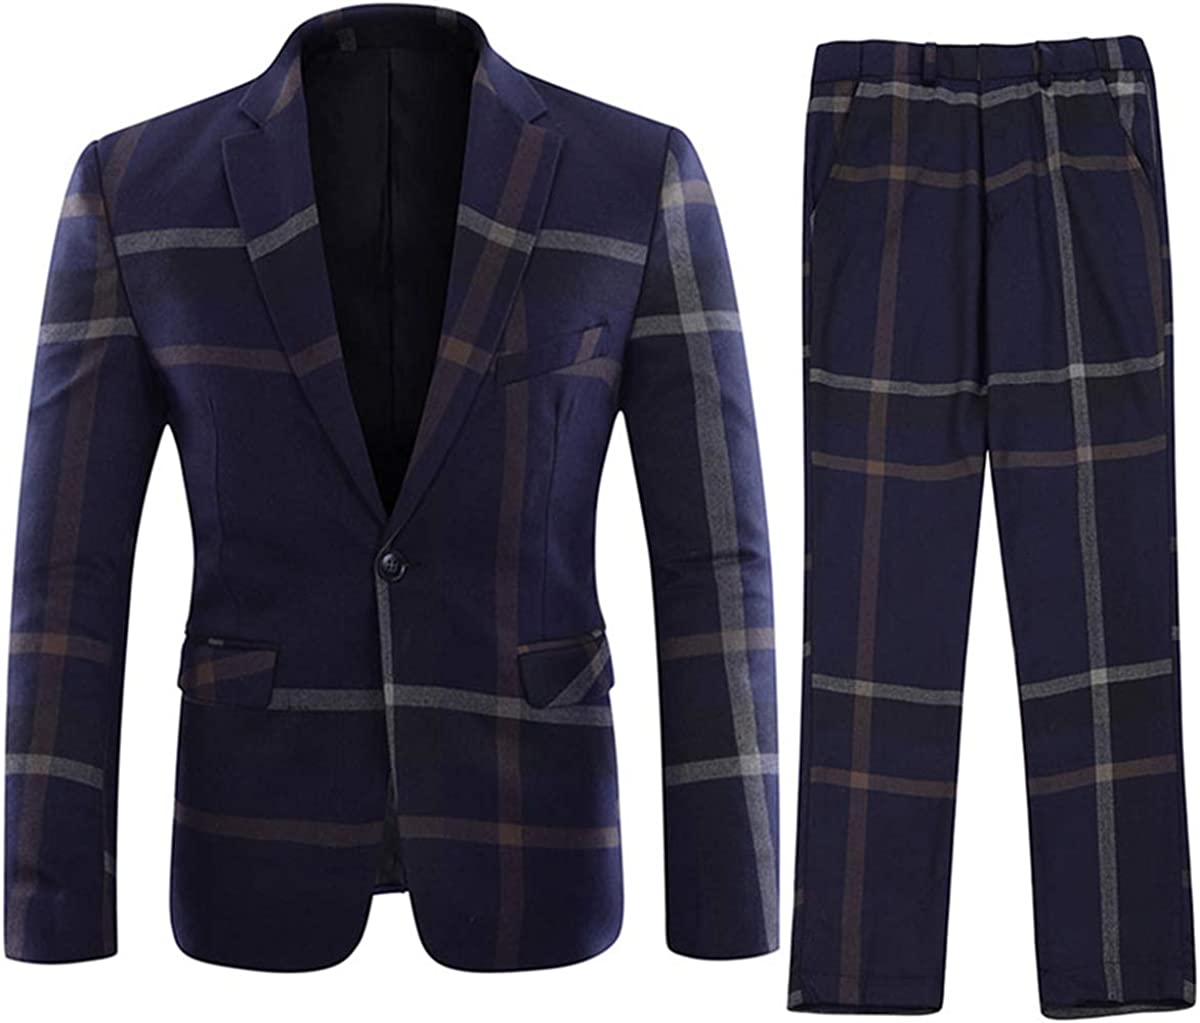 YFFUSHI Mens Plaid 2 Piece Suit Tux Shipping included Jacket Blazer Pants Set Many popular brands